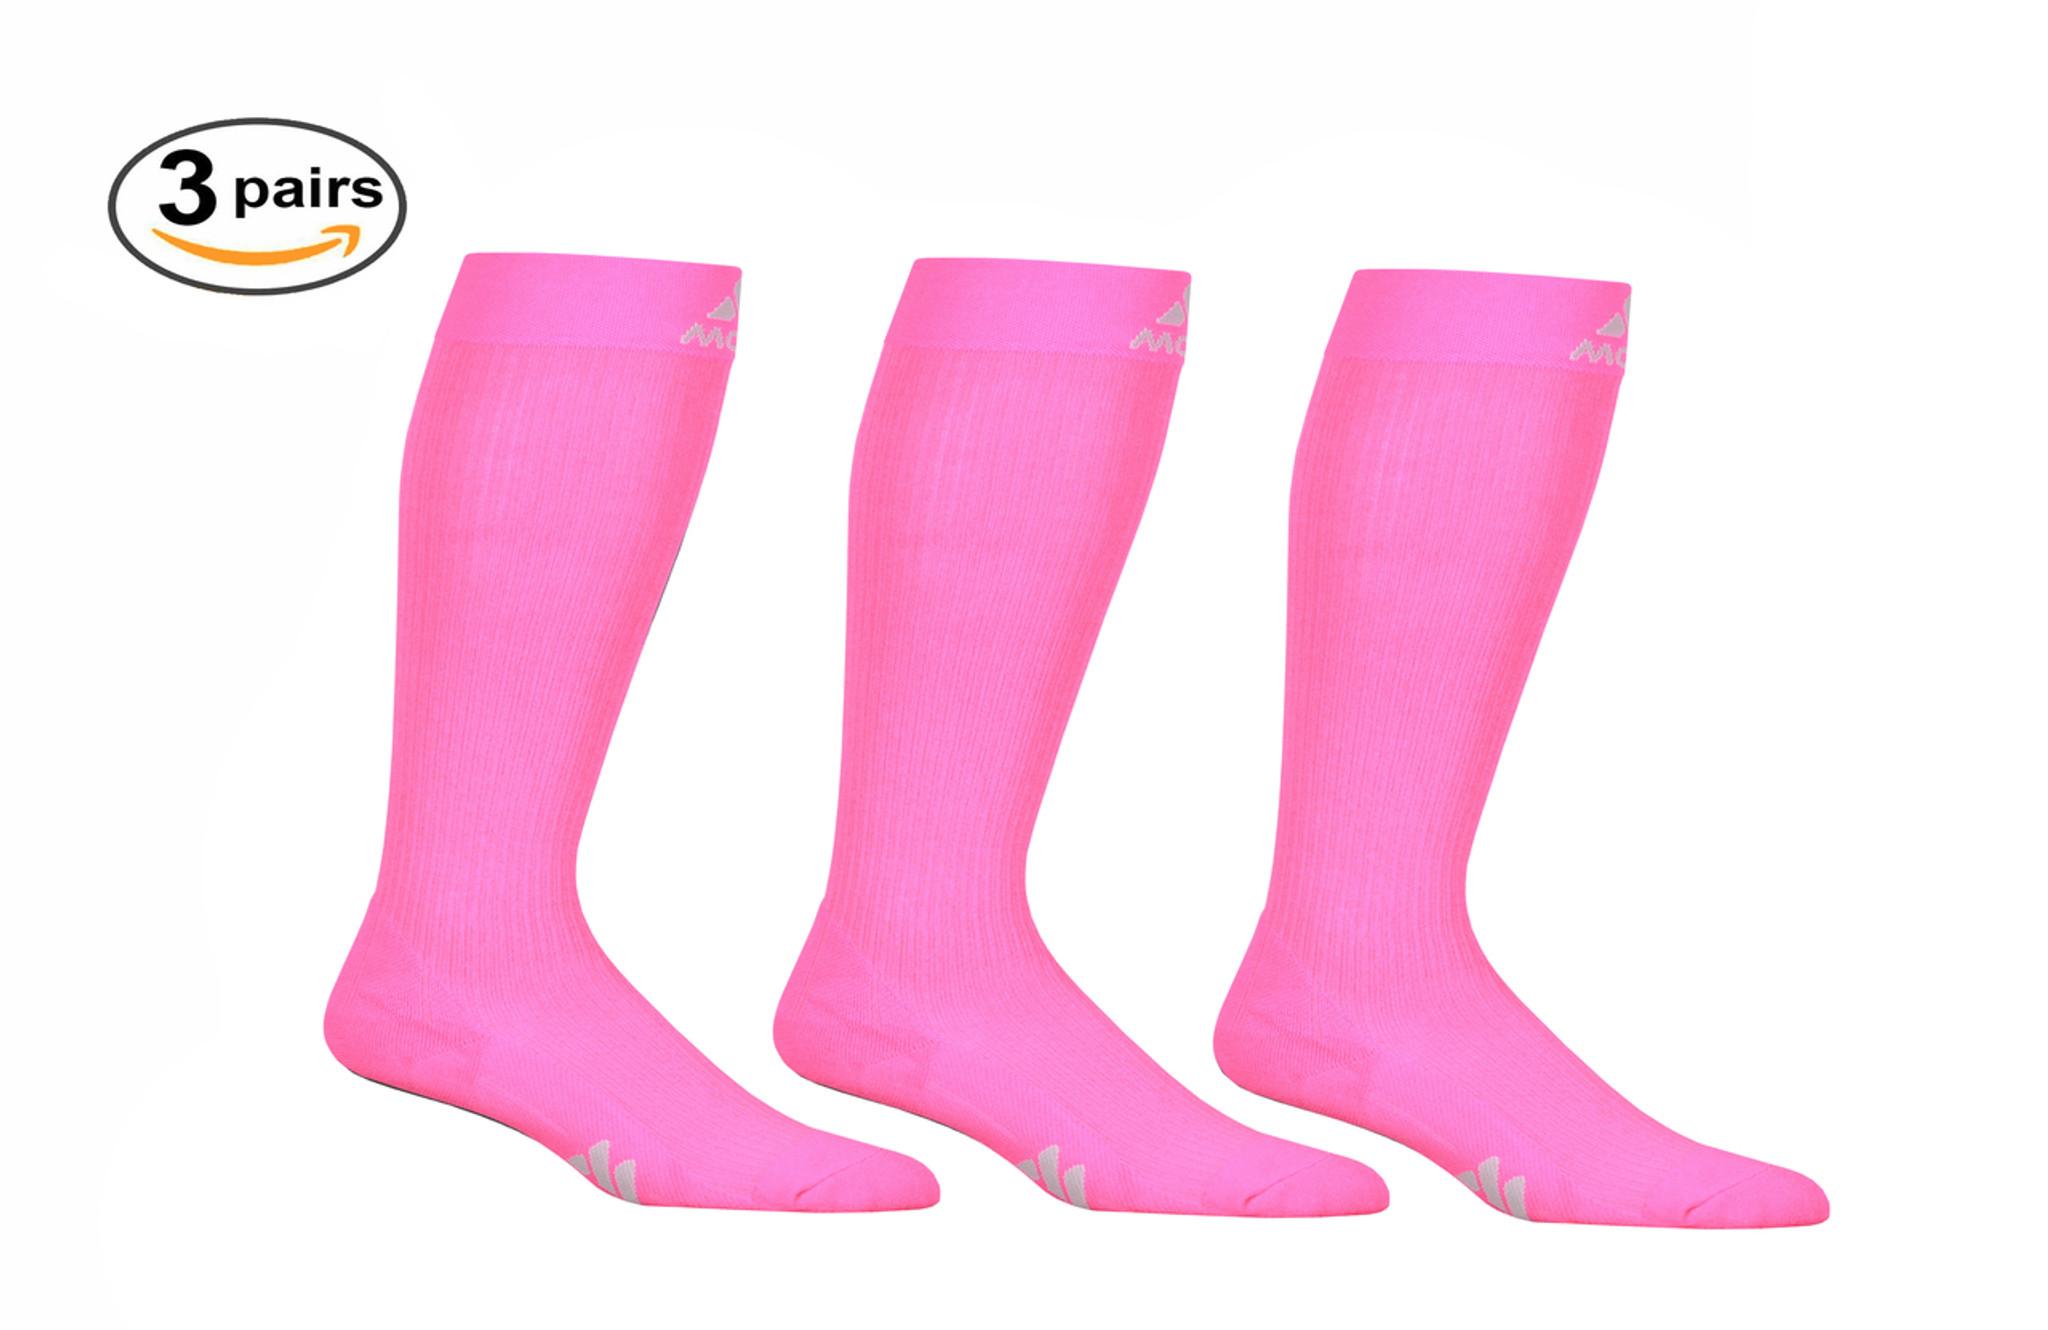 5850dfafd3 M809 - Mojo Compression Socks Comfortable Coolmax Material for ...